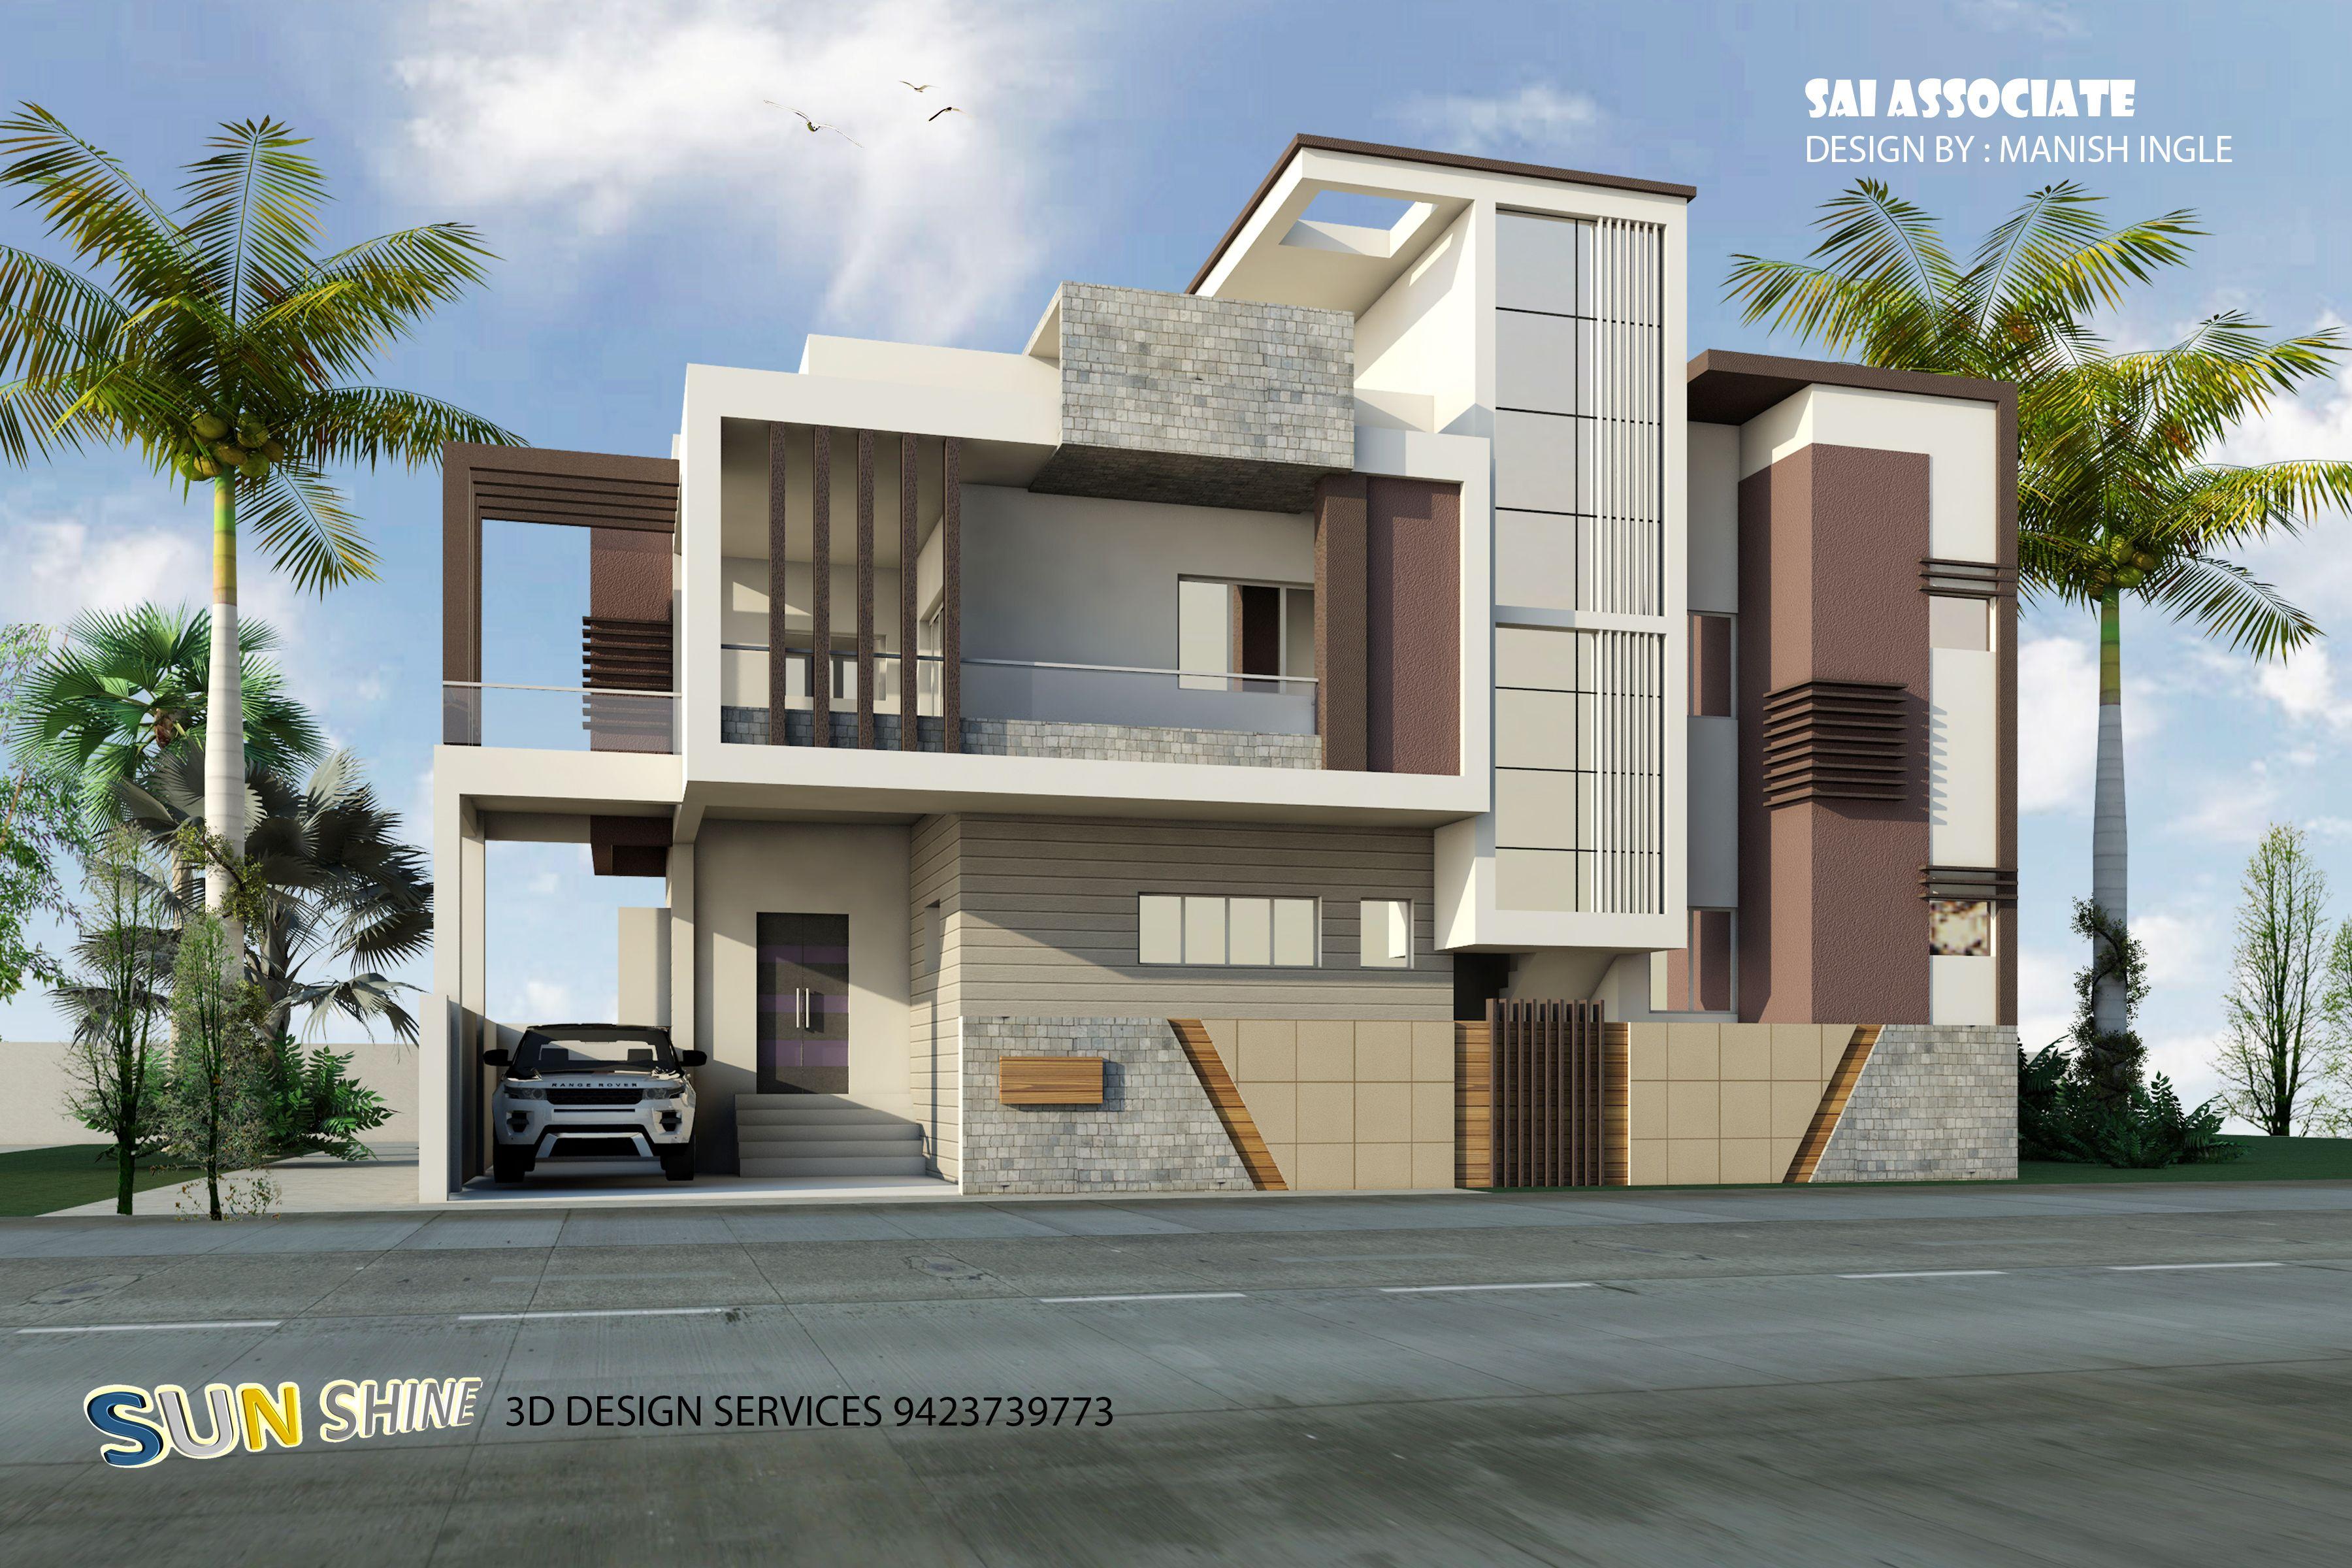 Beautiful home design also amar singh shanty in house rh pinterest